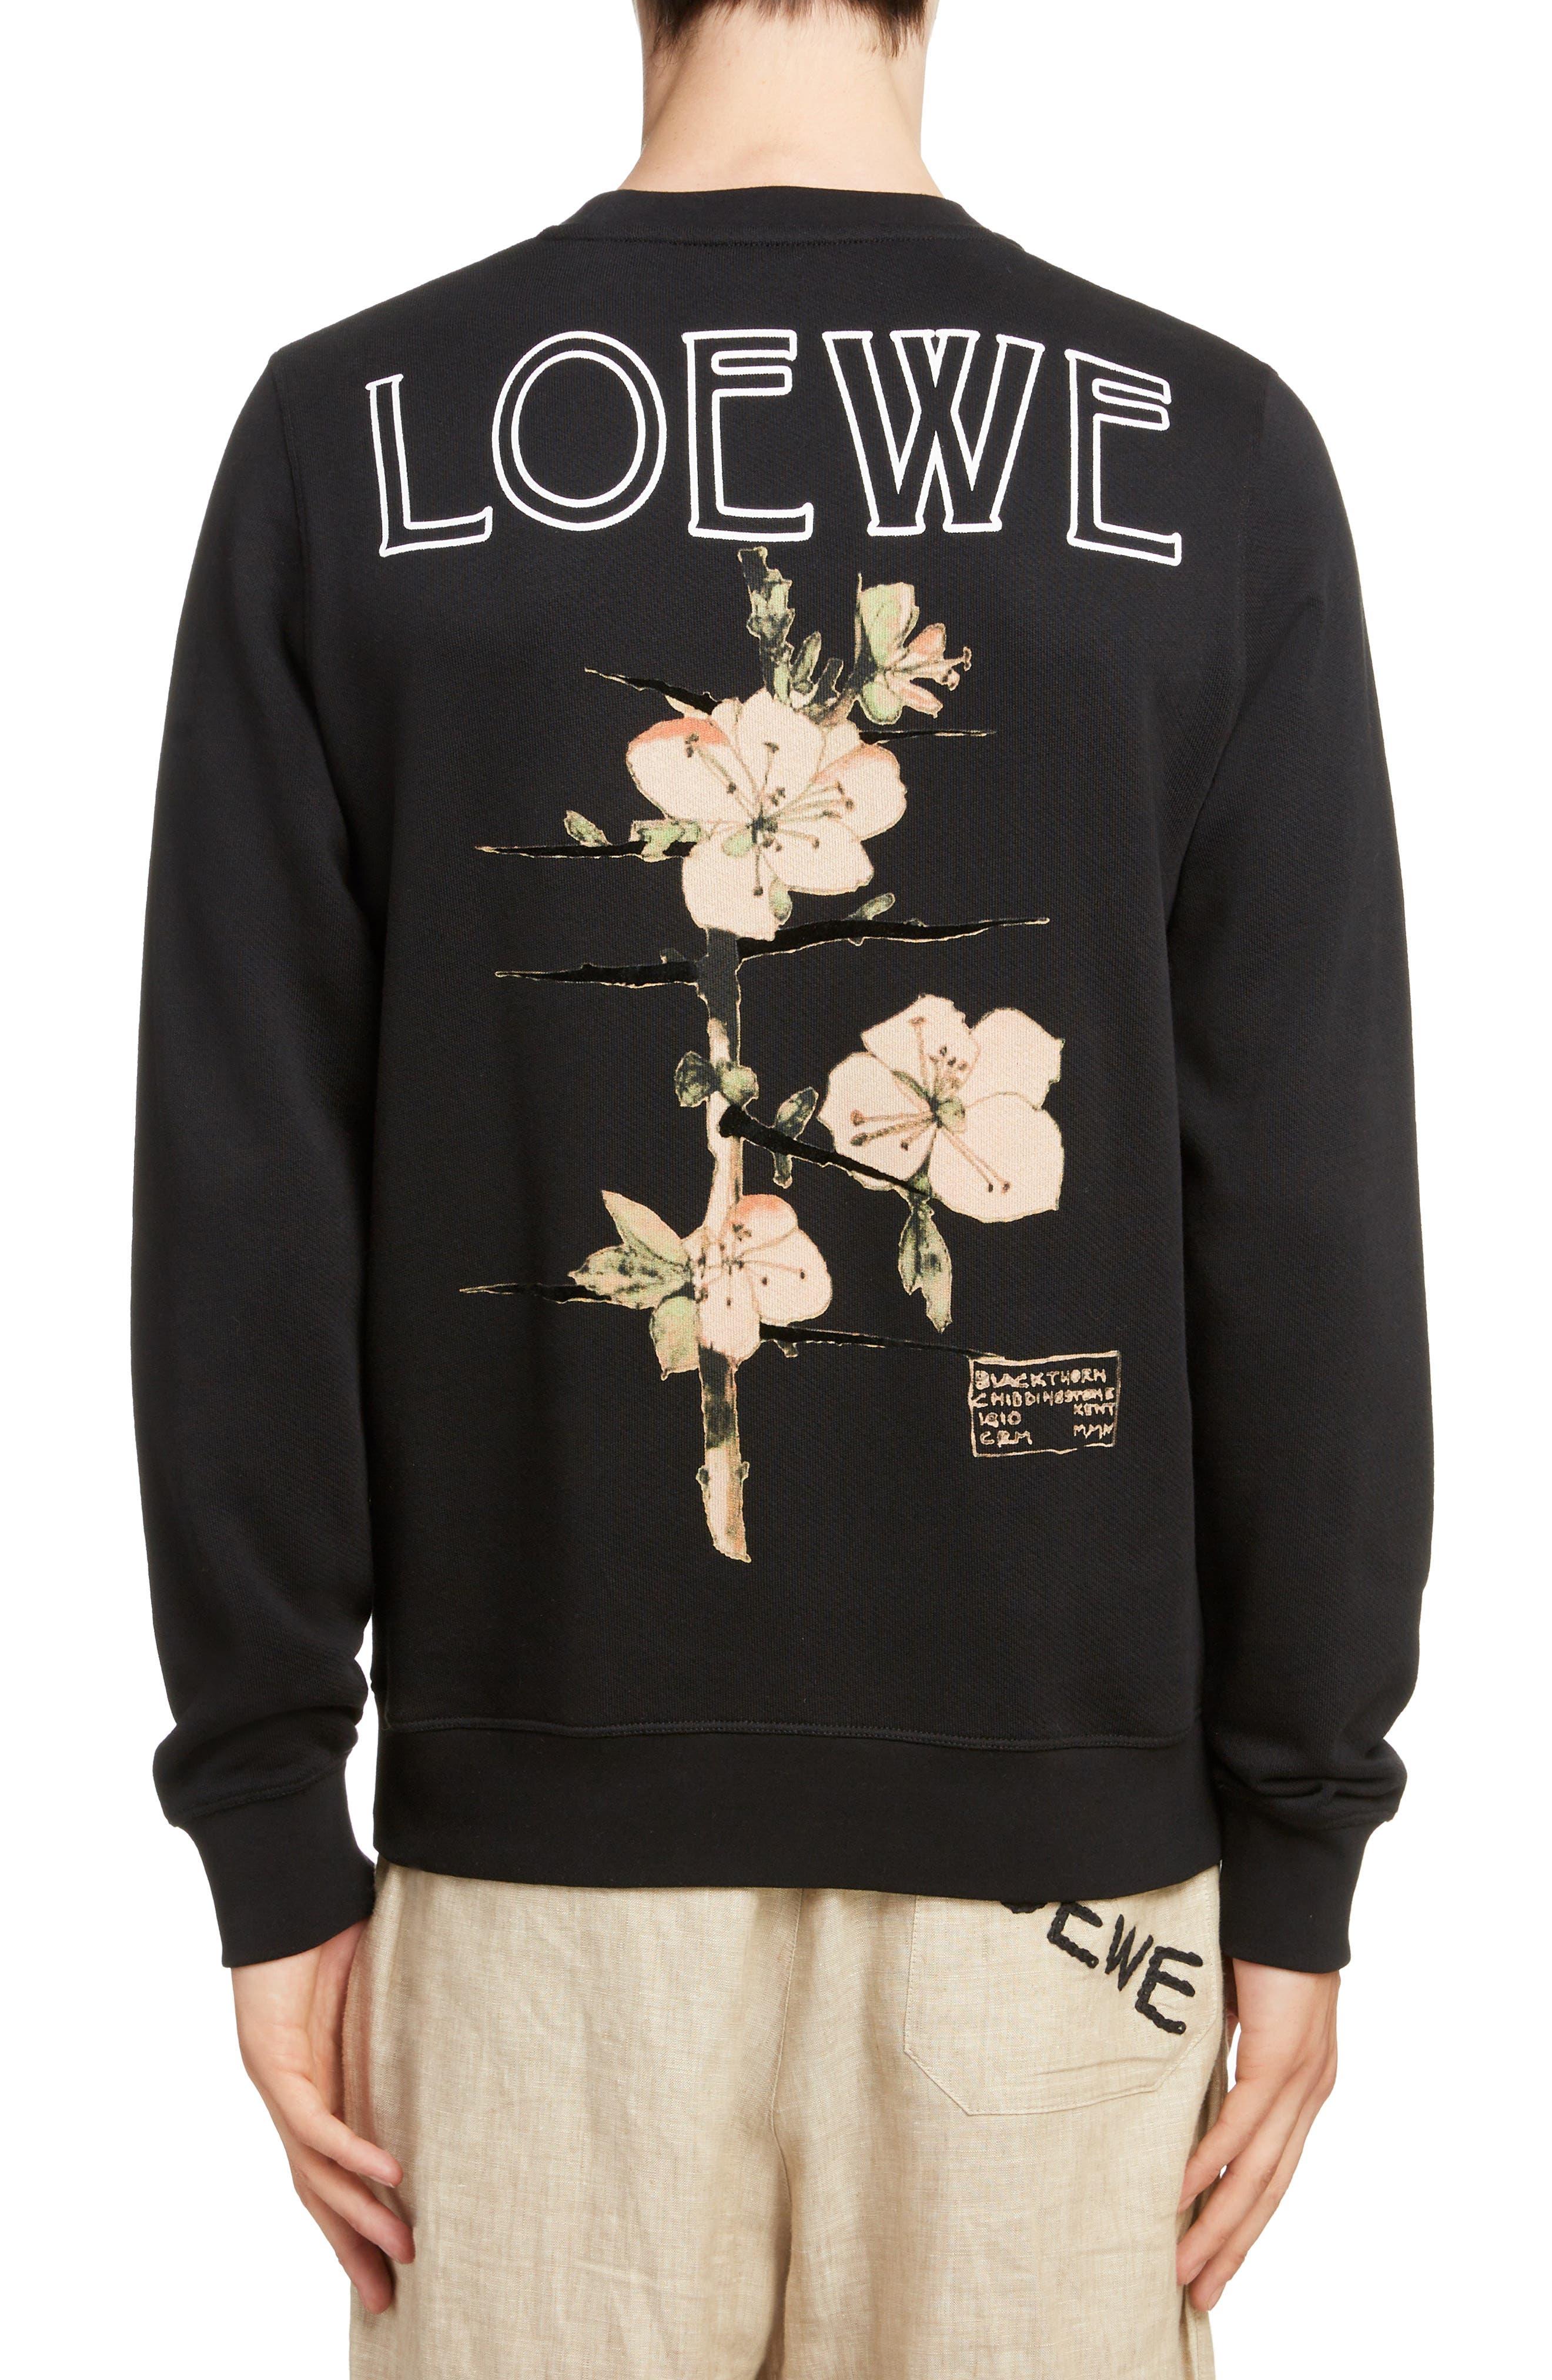 LOEWE, Charles Rennie Mackintosh Collection Botanical Print Sweatshirt, Alternate thumbnail 2, color, 1100-BLACK